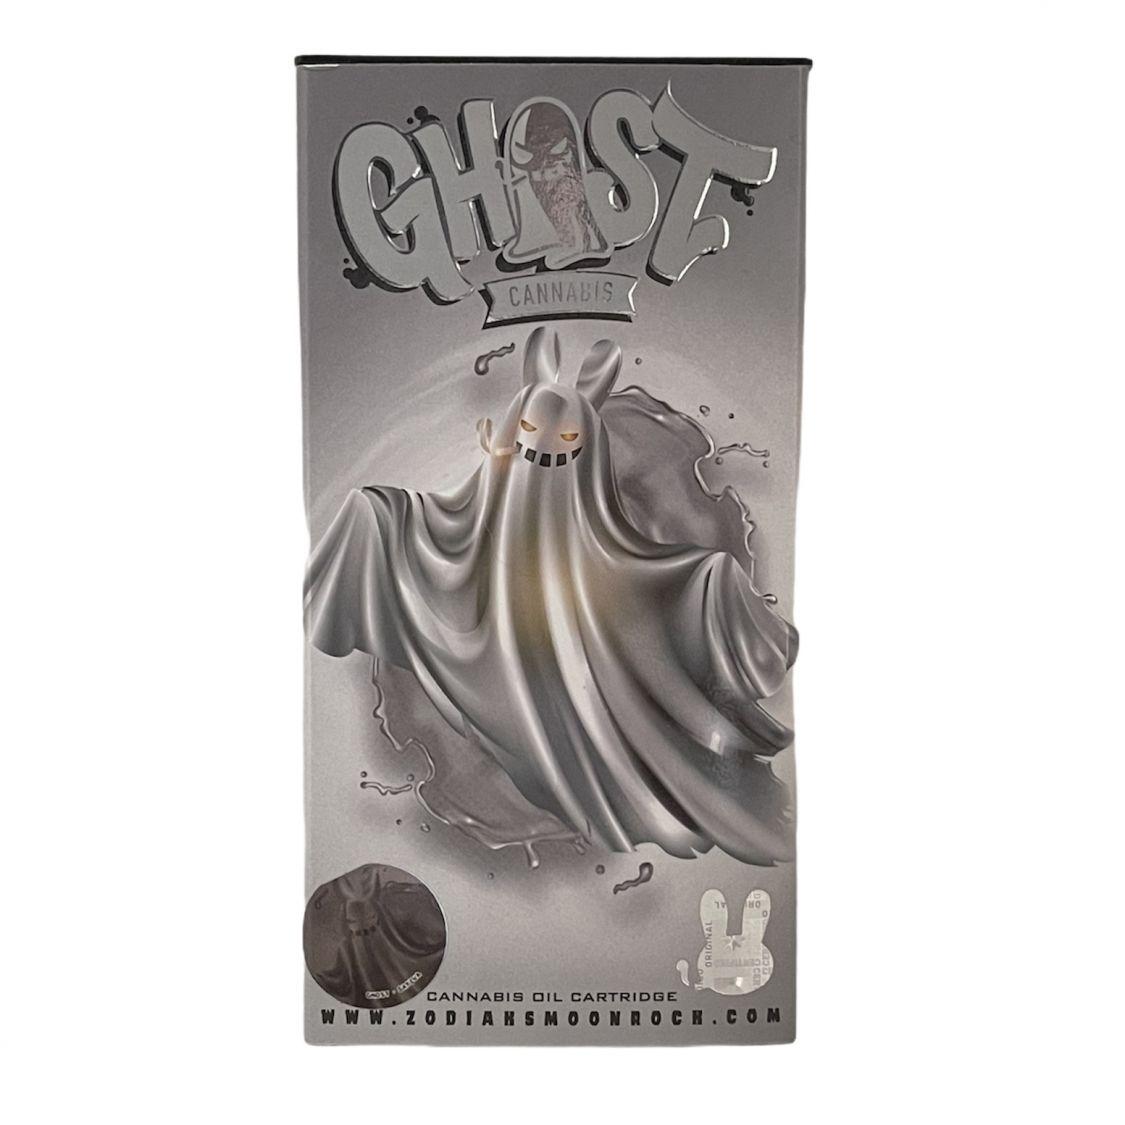 Dr. Zodiak Ghost Cartridge, Sativa Cartridges 510 Thread